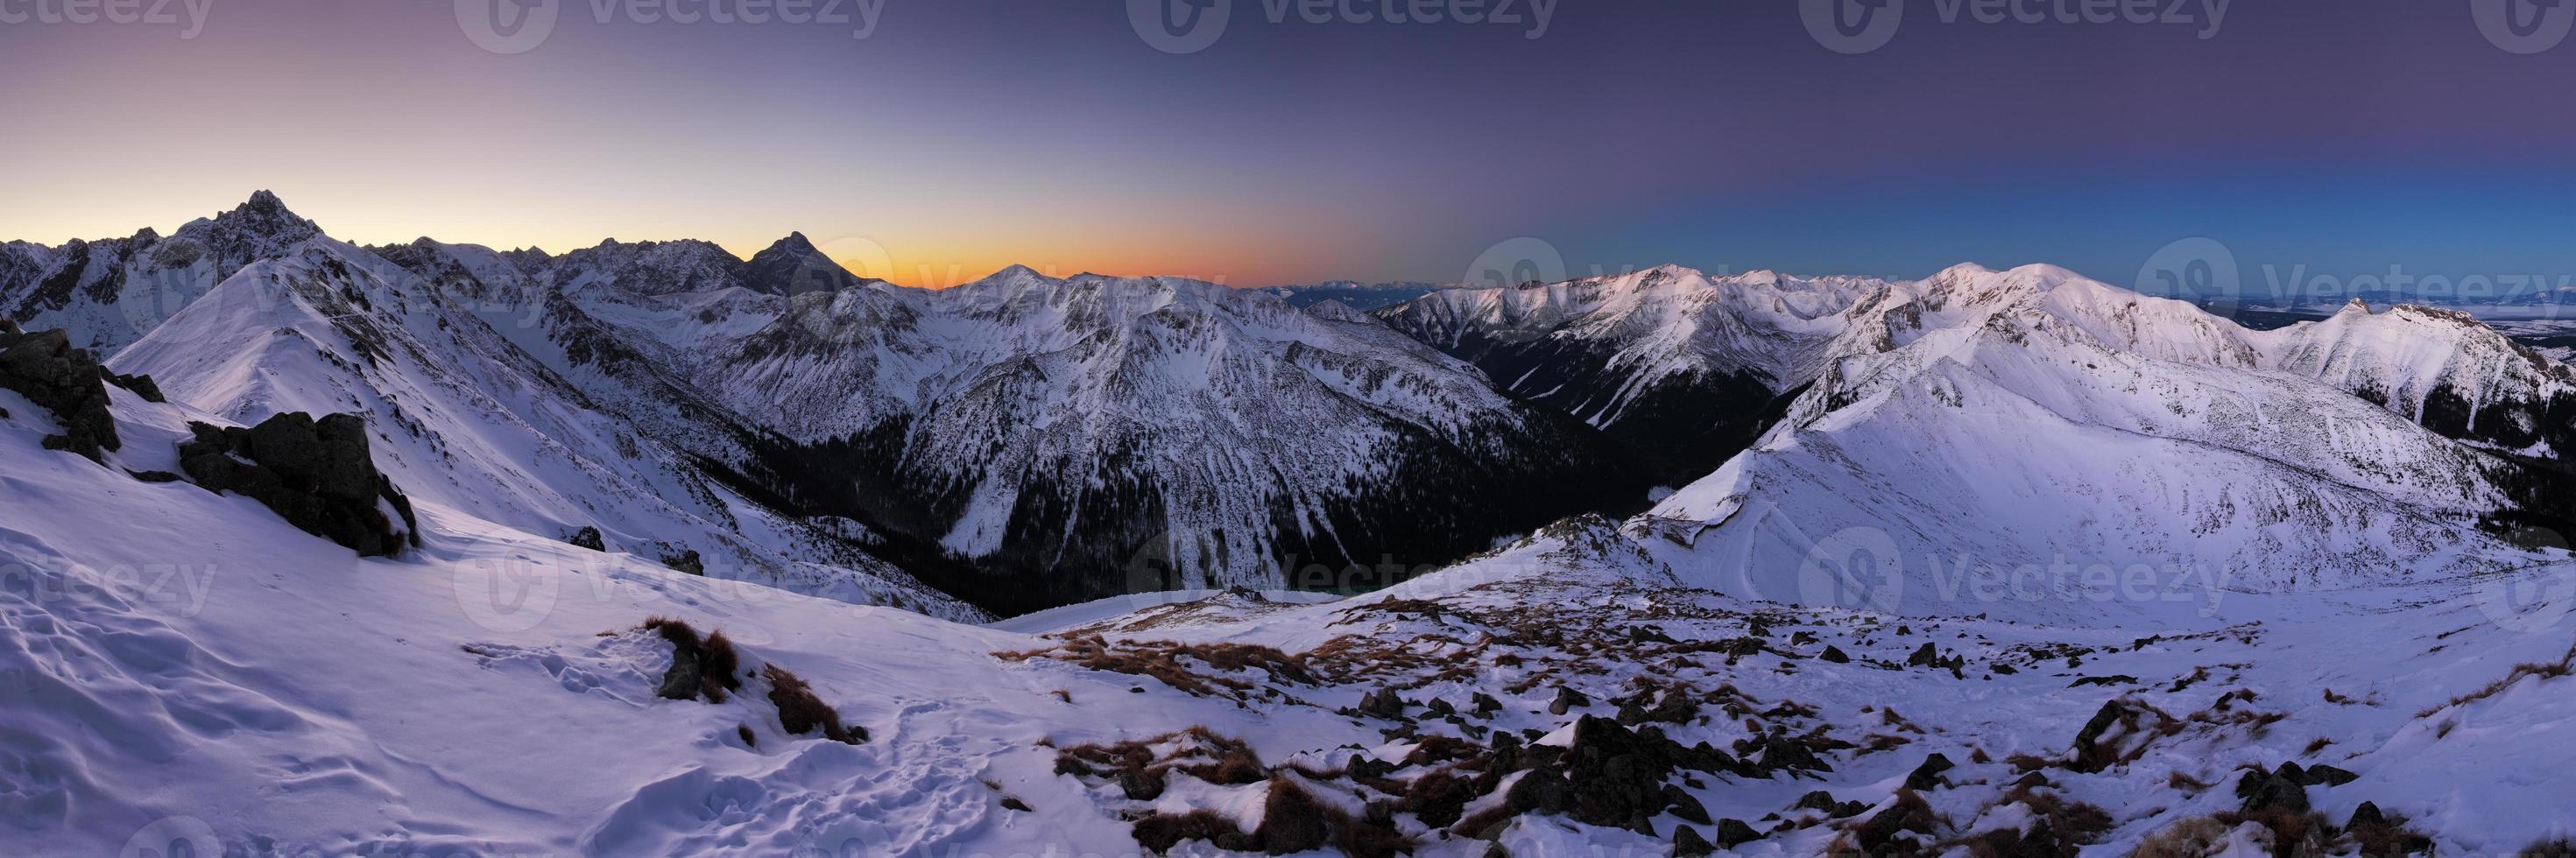 montanha do inverno na polônia, kasprowy foto